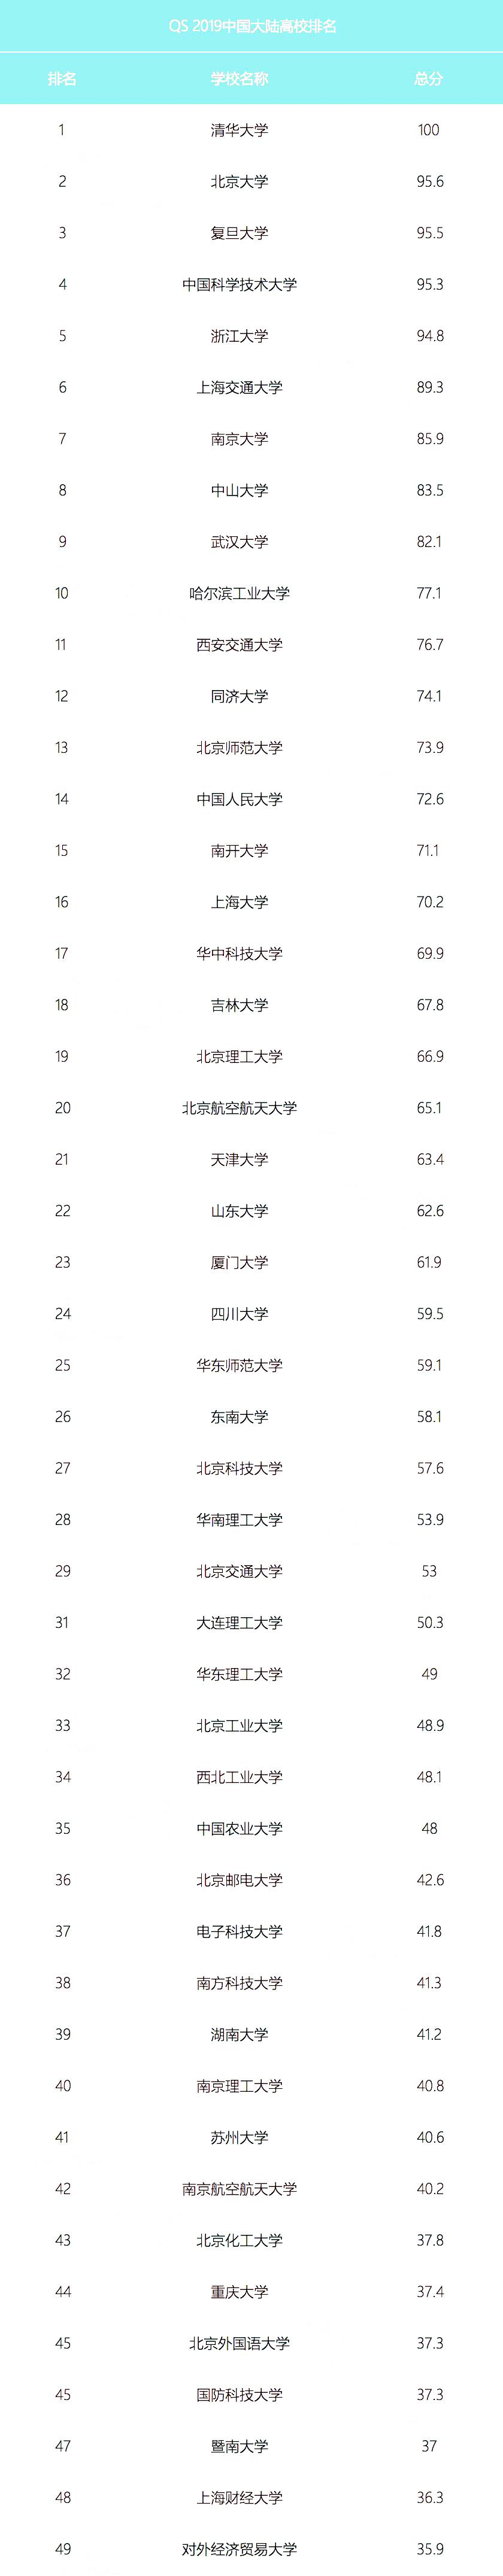 QS发布首个中国大陆排名,99所高校上榜!